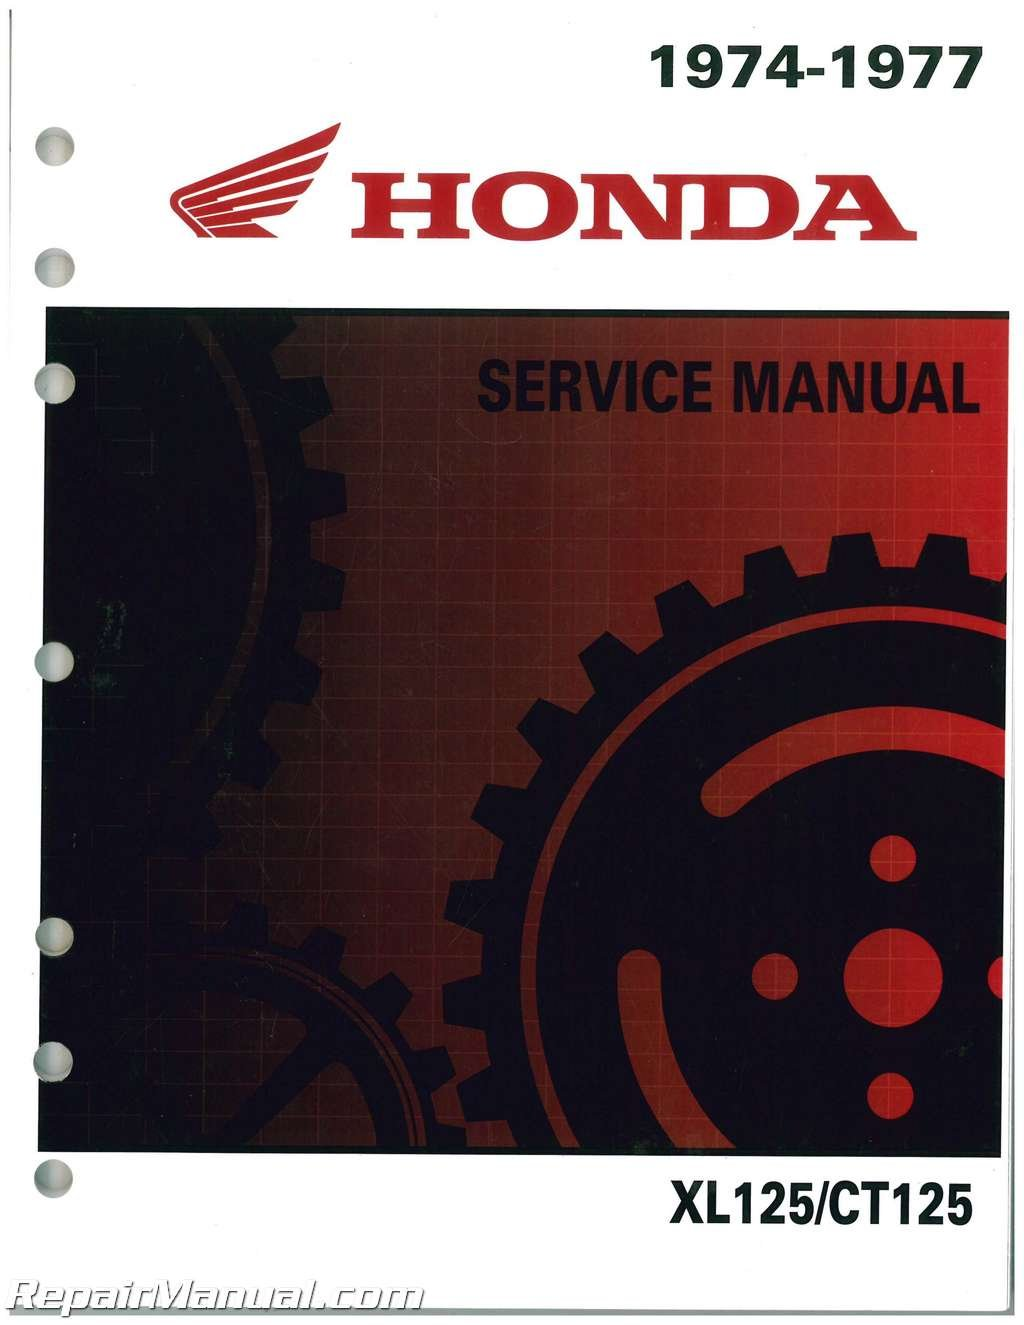 6136506 1974-1978 XL125, 1977 CT125 Honda Motorcycle Shop Manual:  Manufacturer: Amazon.com: Books